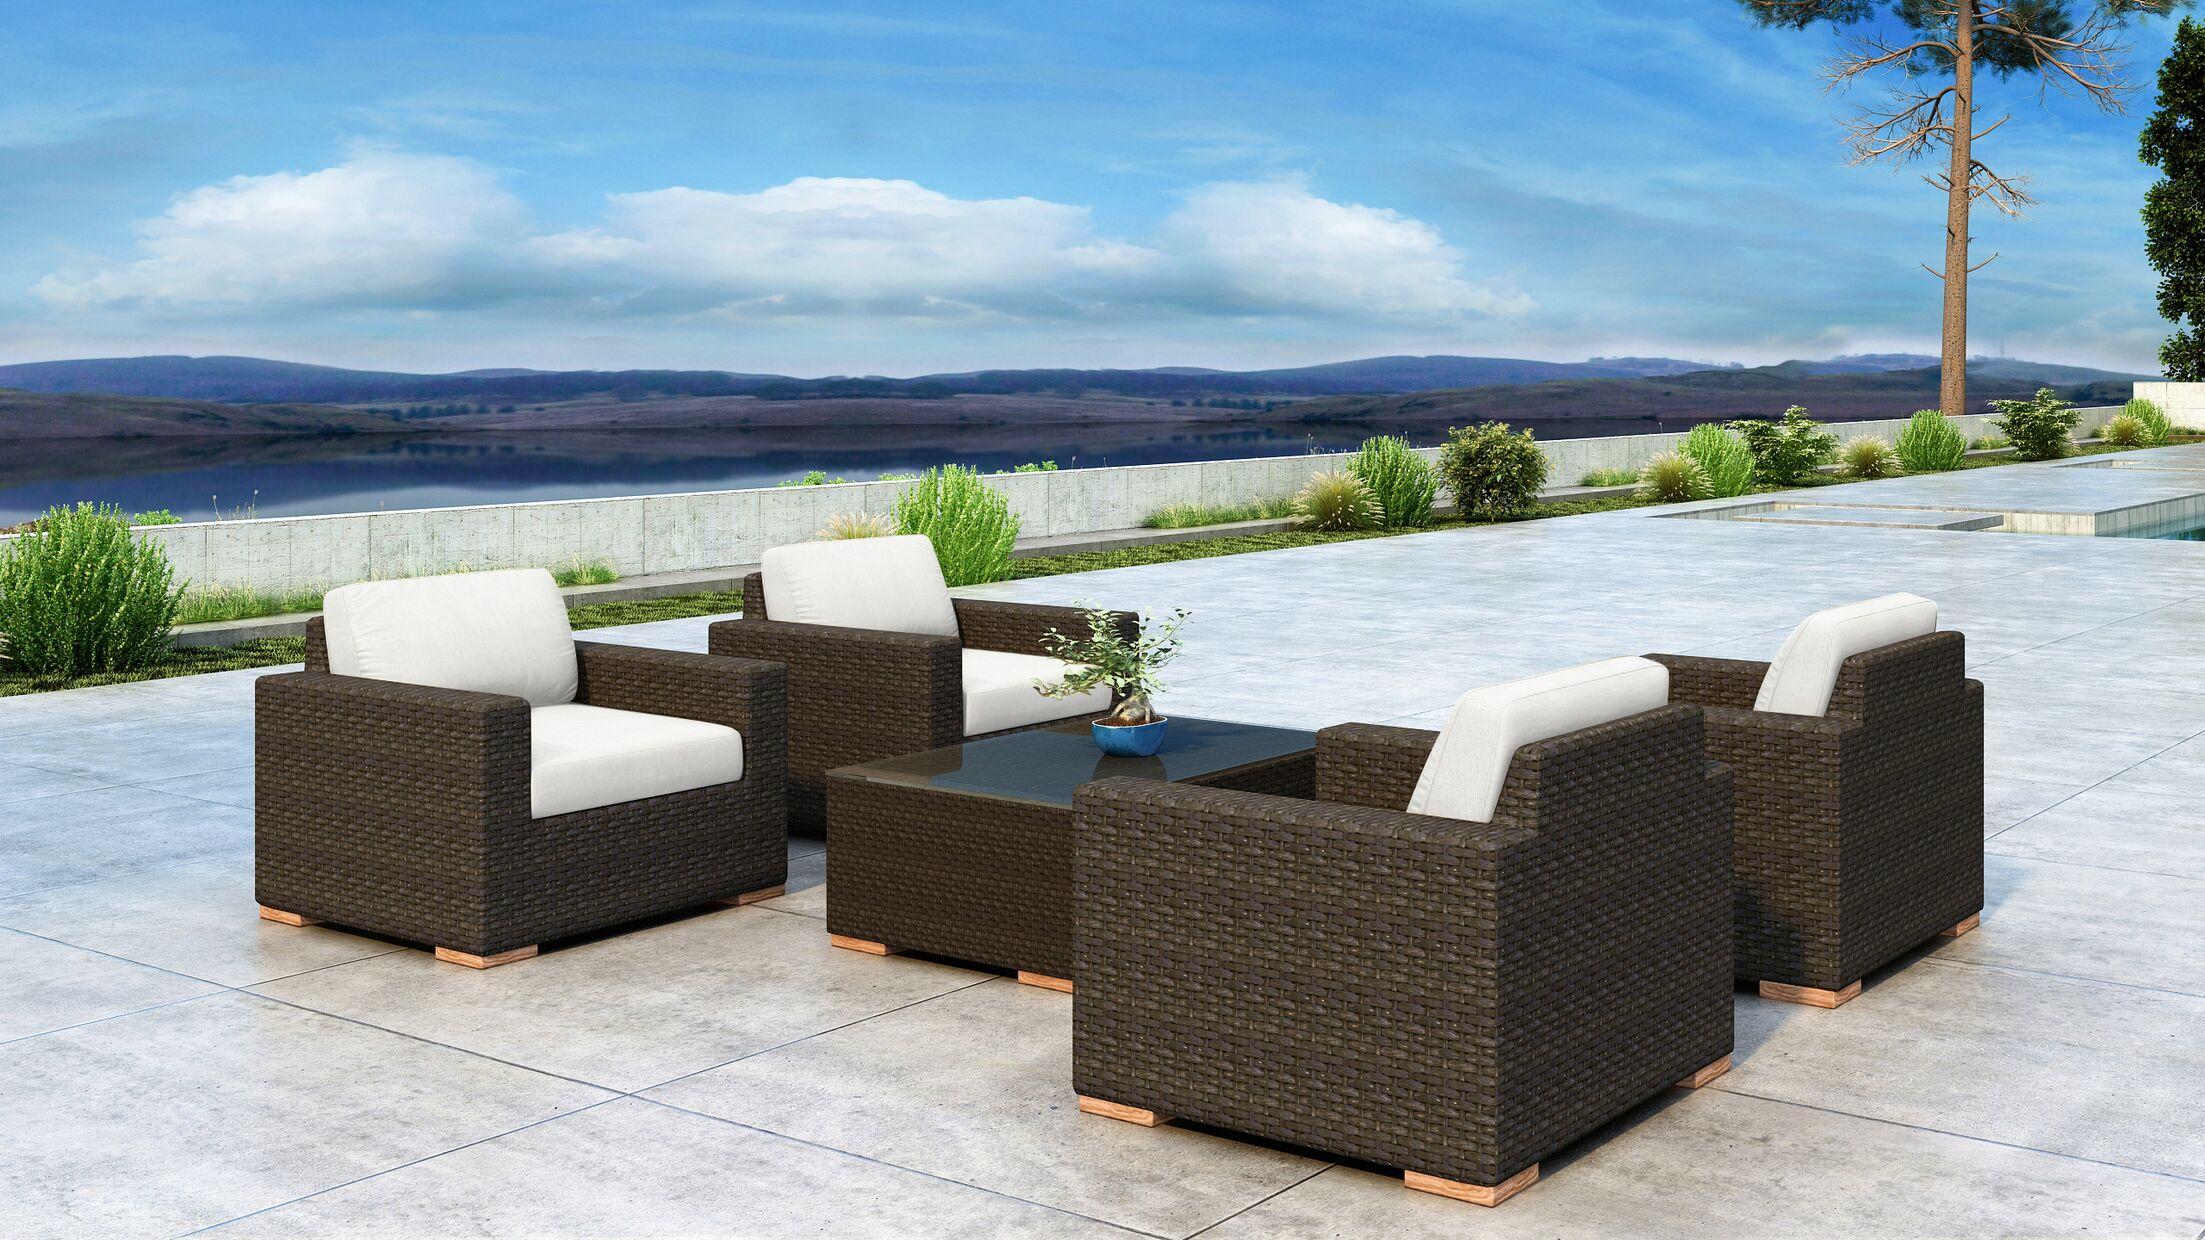 Glen Ellyn 5 Piece Sofa Set with Sunbrella Cushion Cushion Color: Canvas Natural